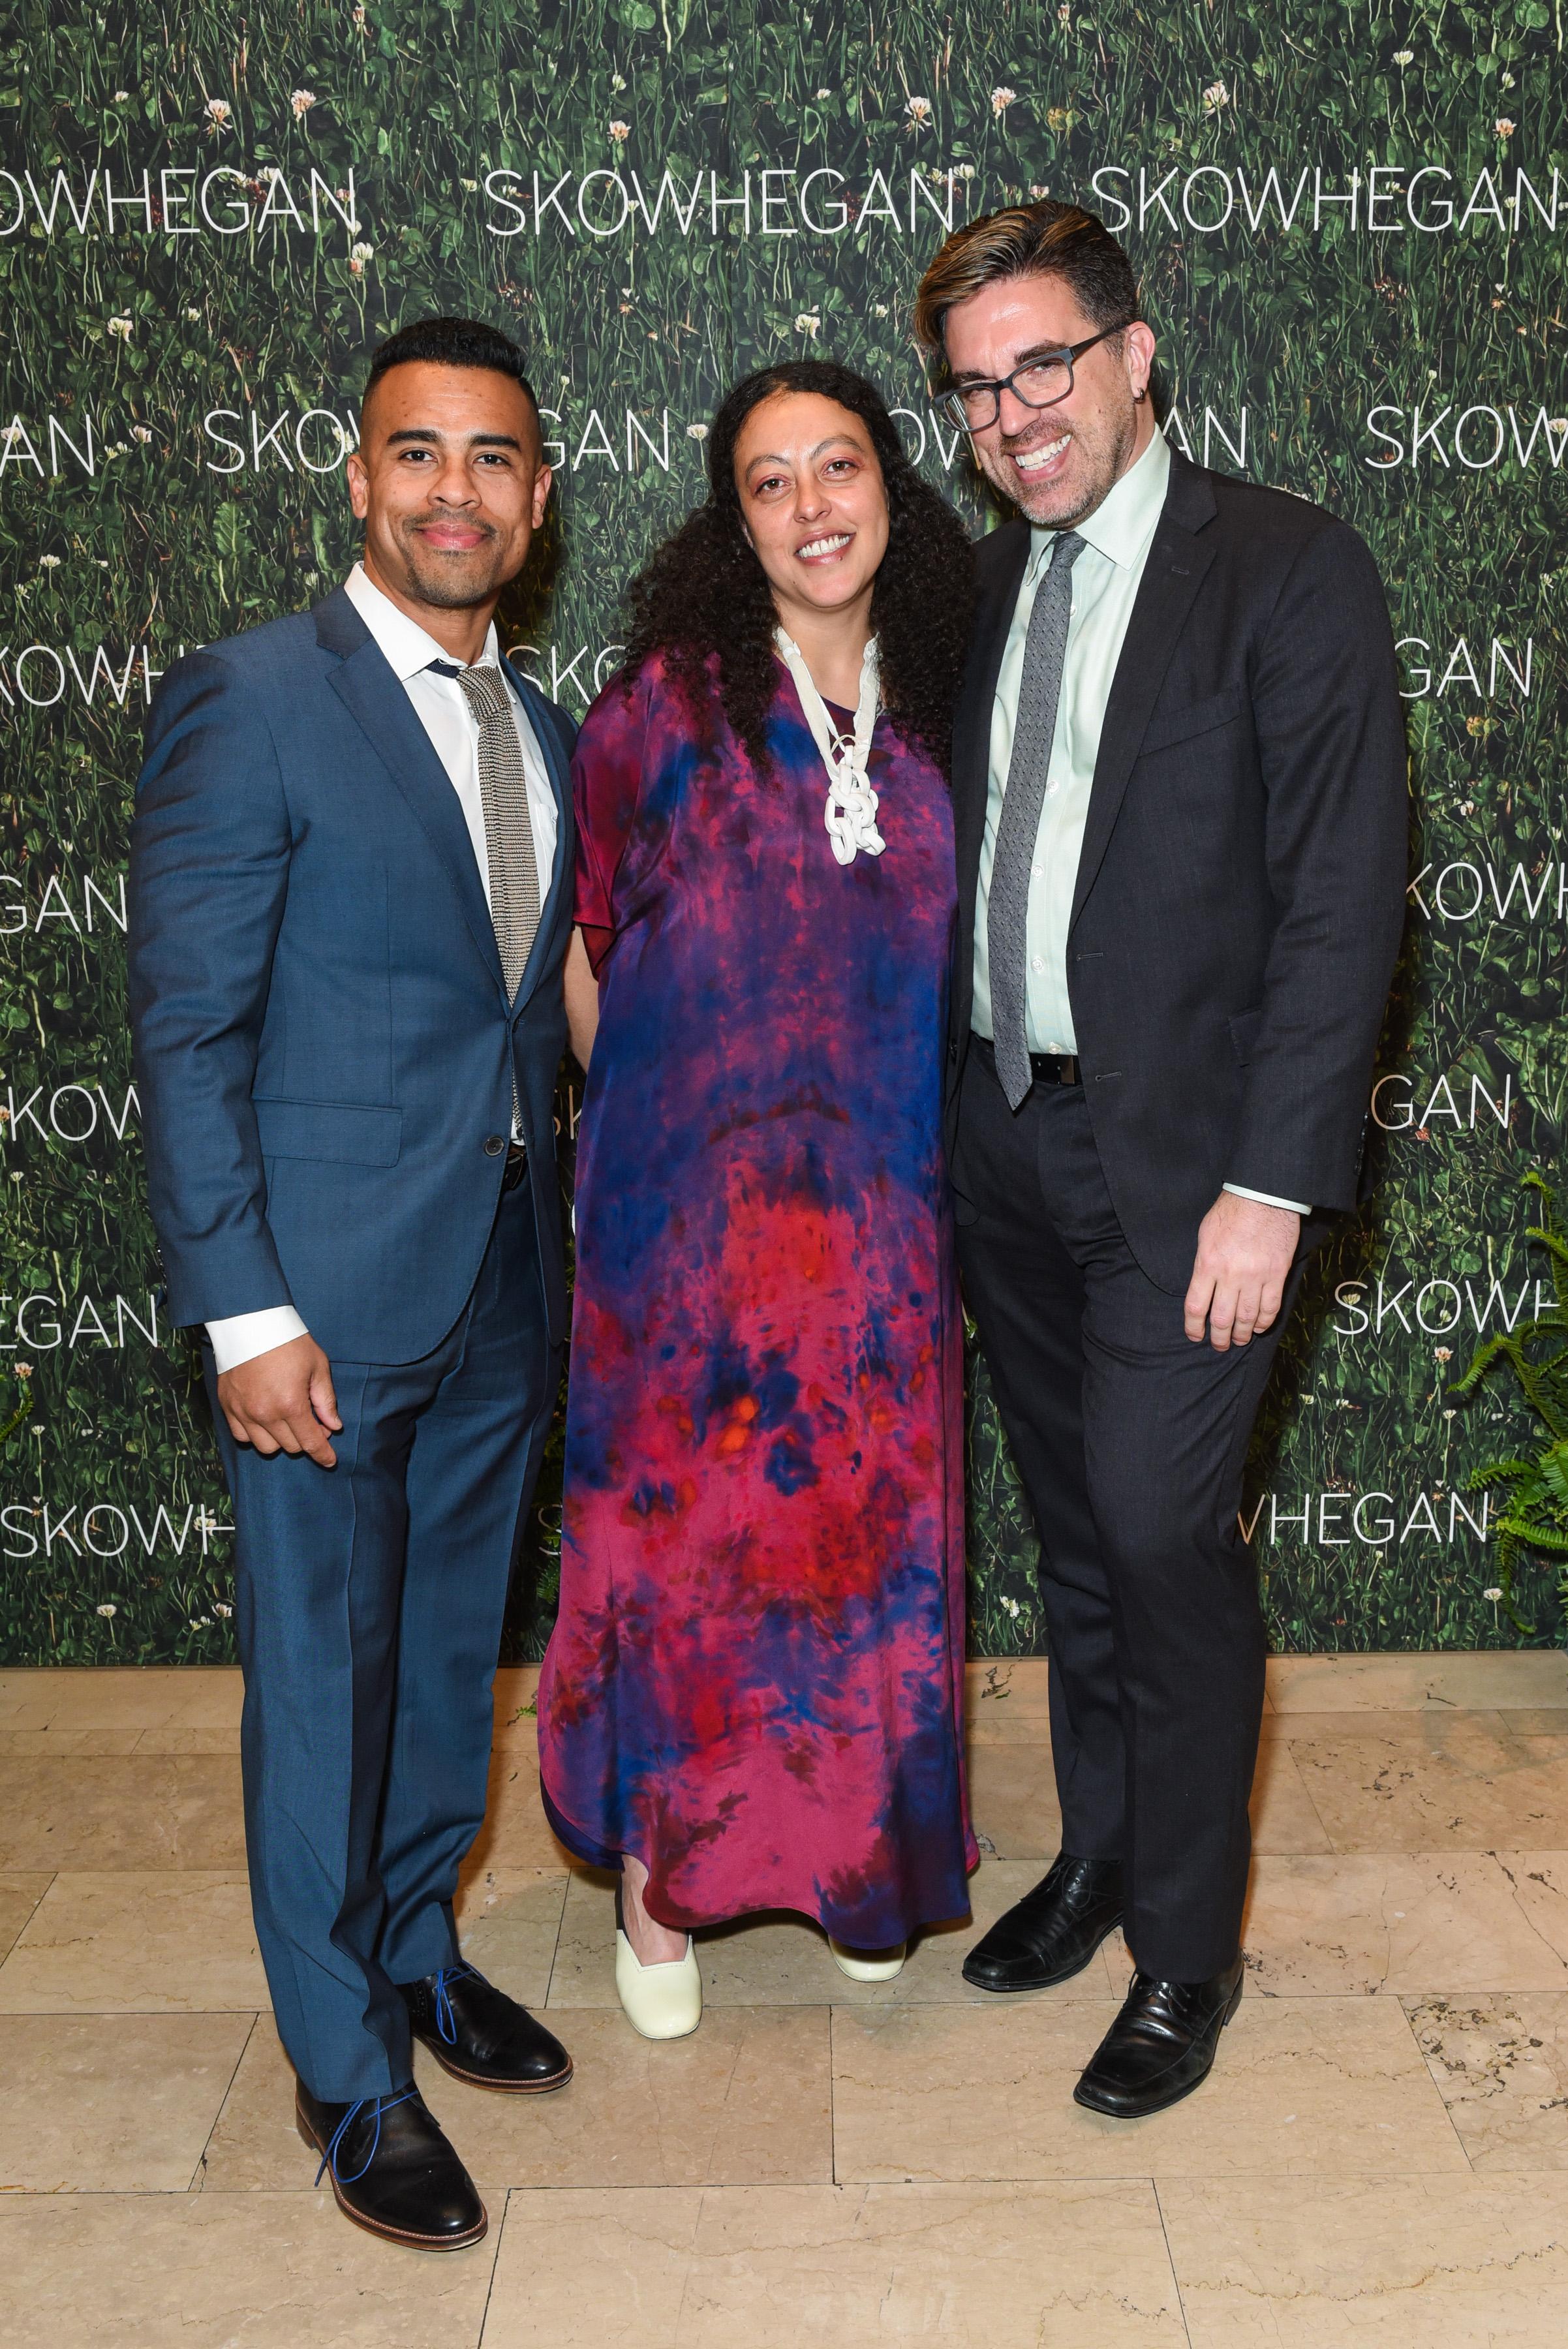 Shaun Leonardo, Sarah Workneh, Jamie Bennett==Skowhegan Awards Dinner 2018==The Plaza Hotel, New York, NY==April 24, 2018==�Patrick McMullan==Photo - Presley Ann/PMC====